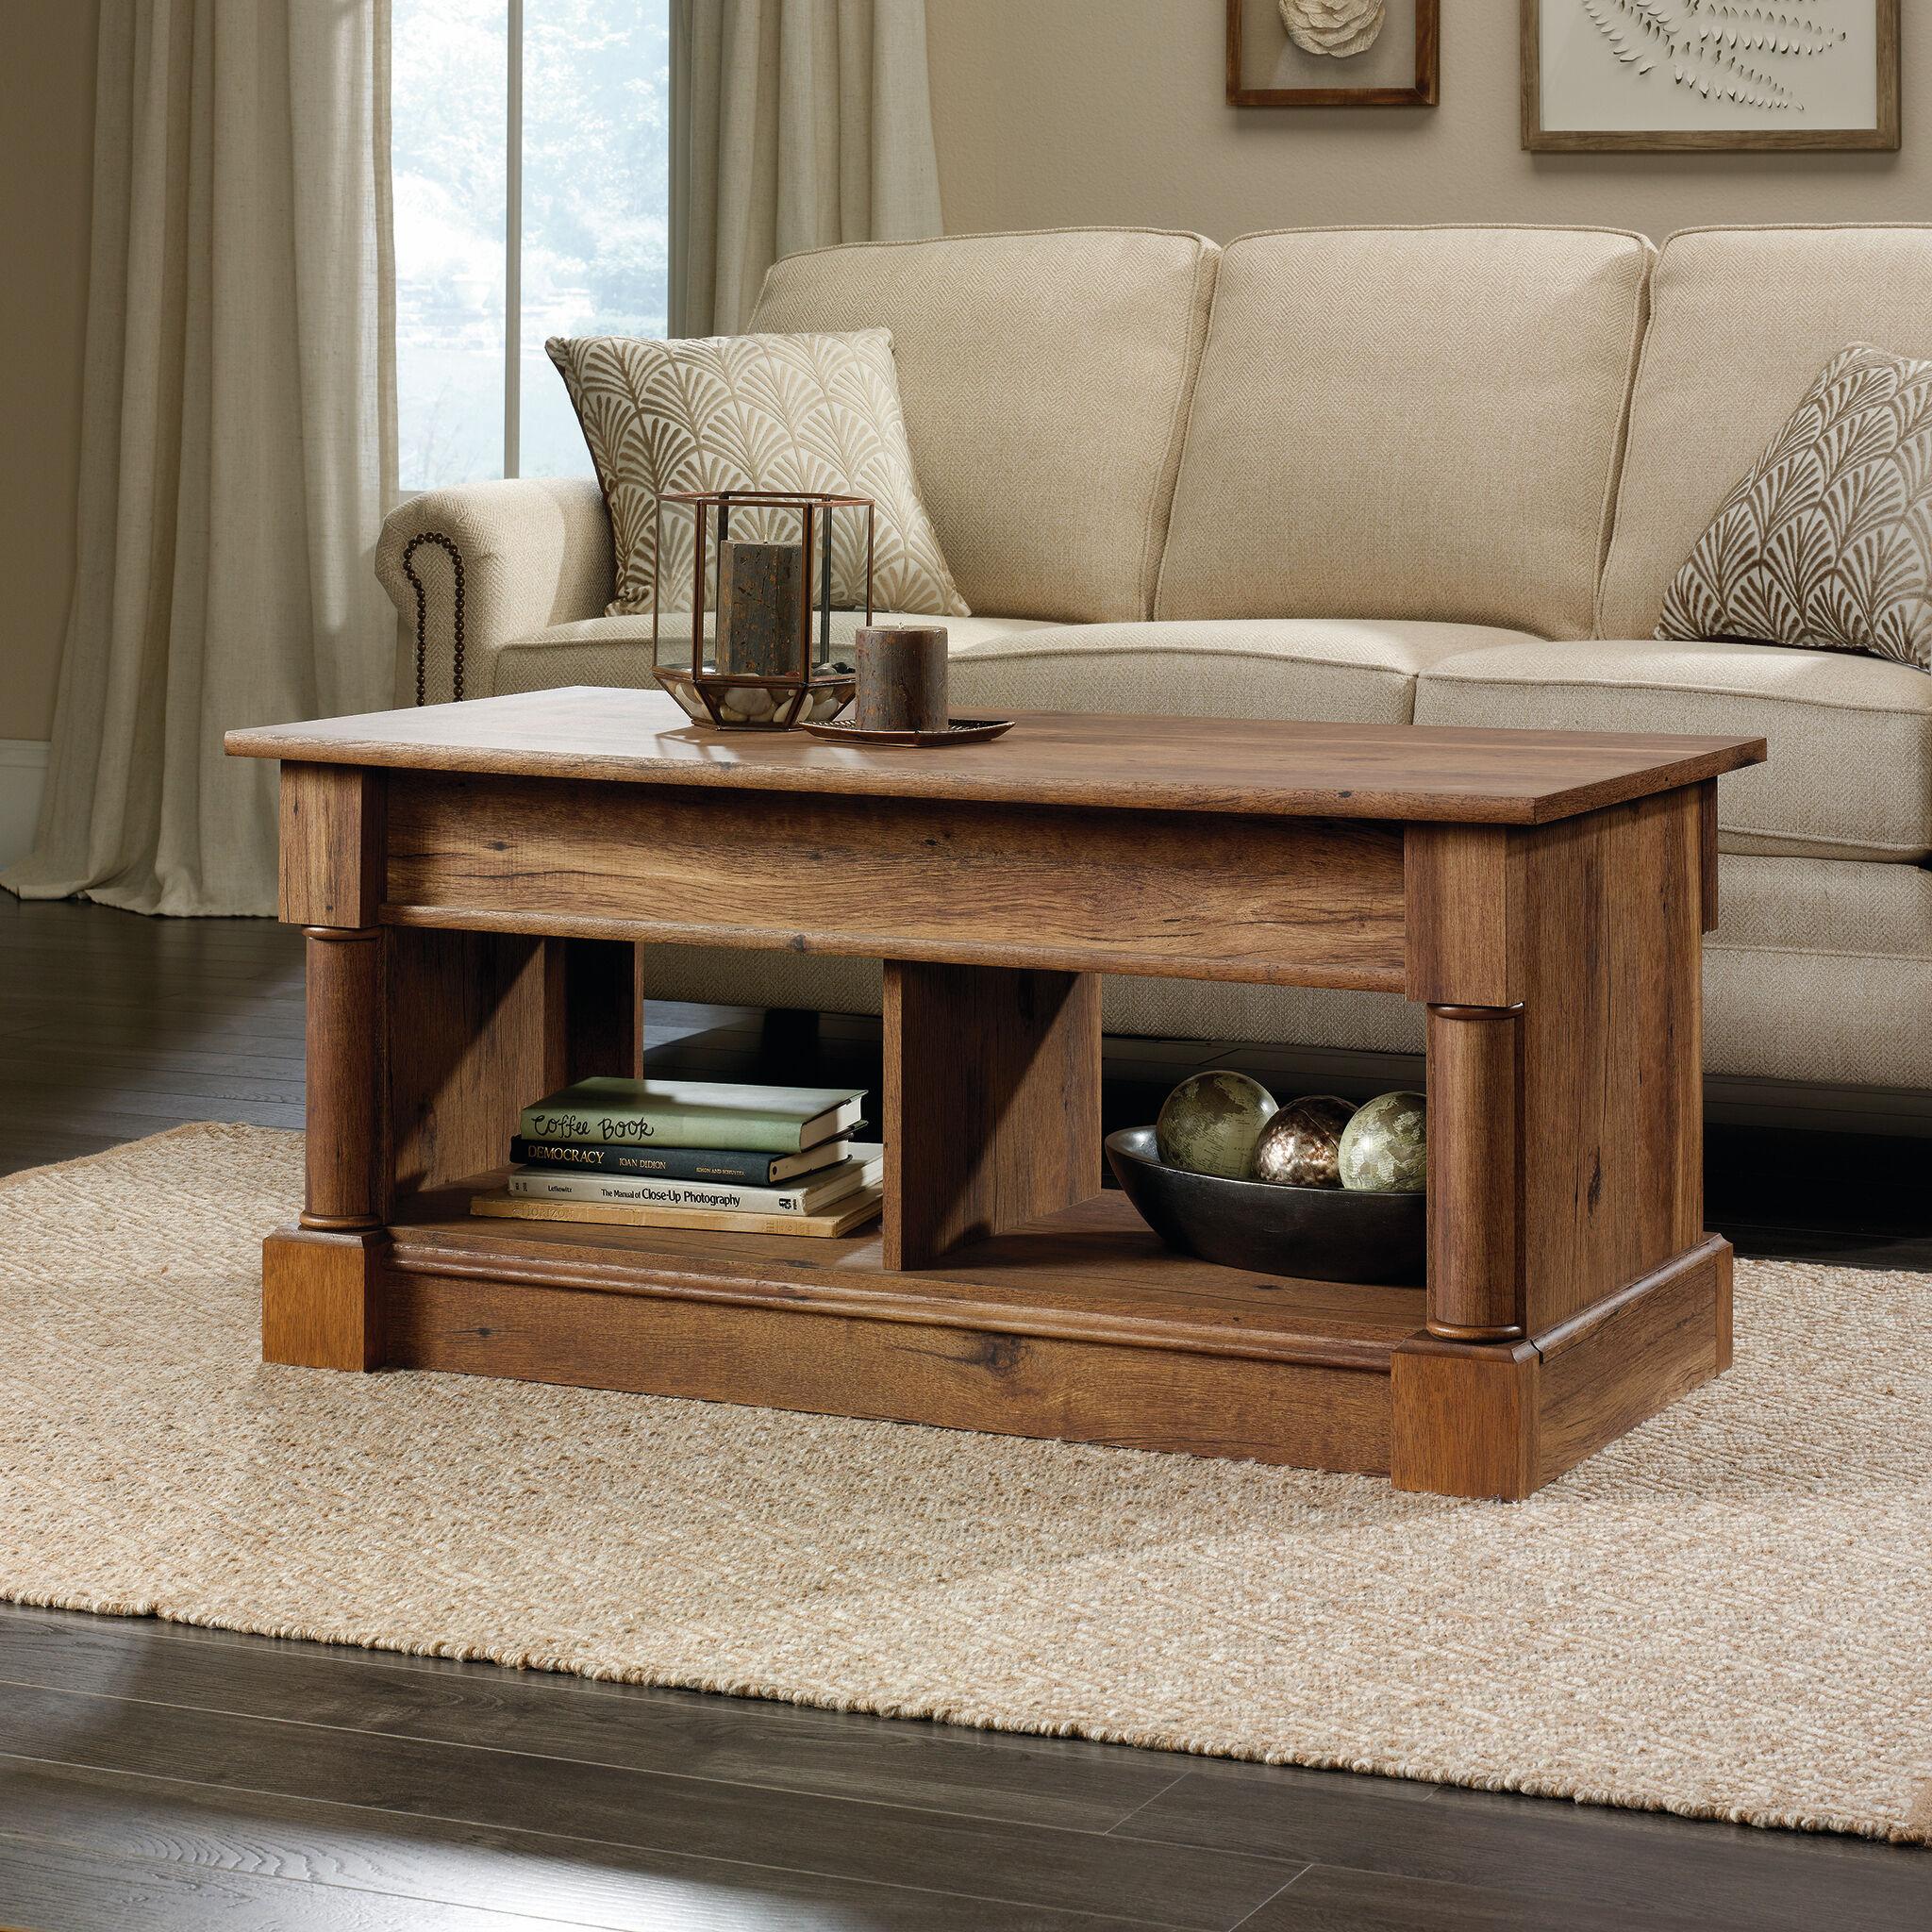 Rectangular Lift Top Contemporary Coffee Tableu0026nbsp;in Vintage Oak